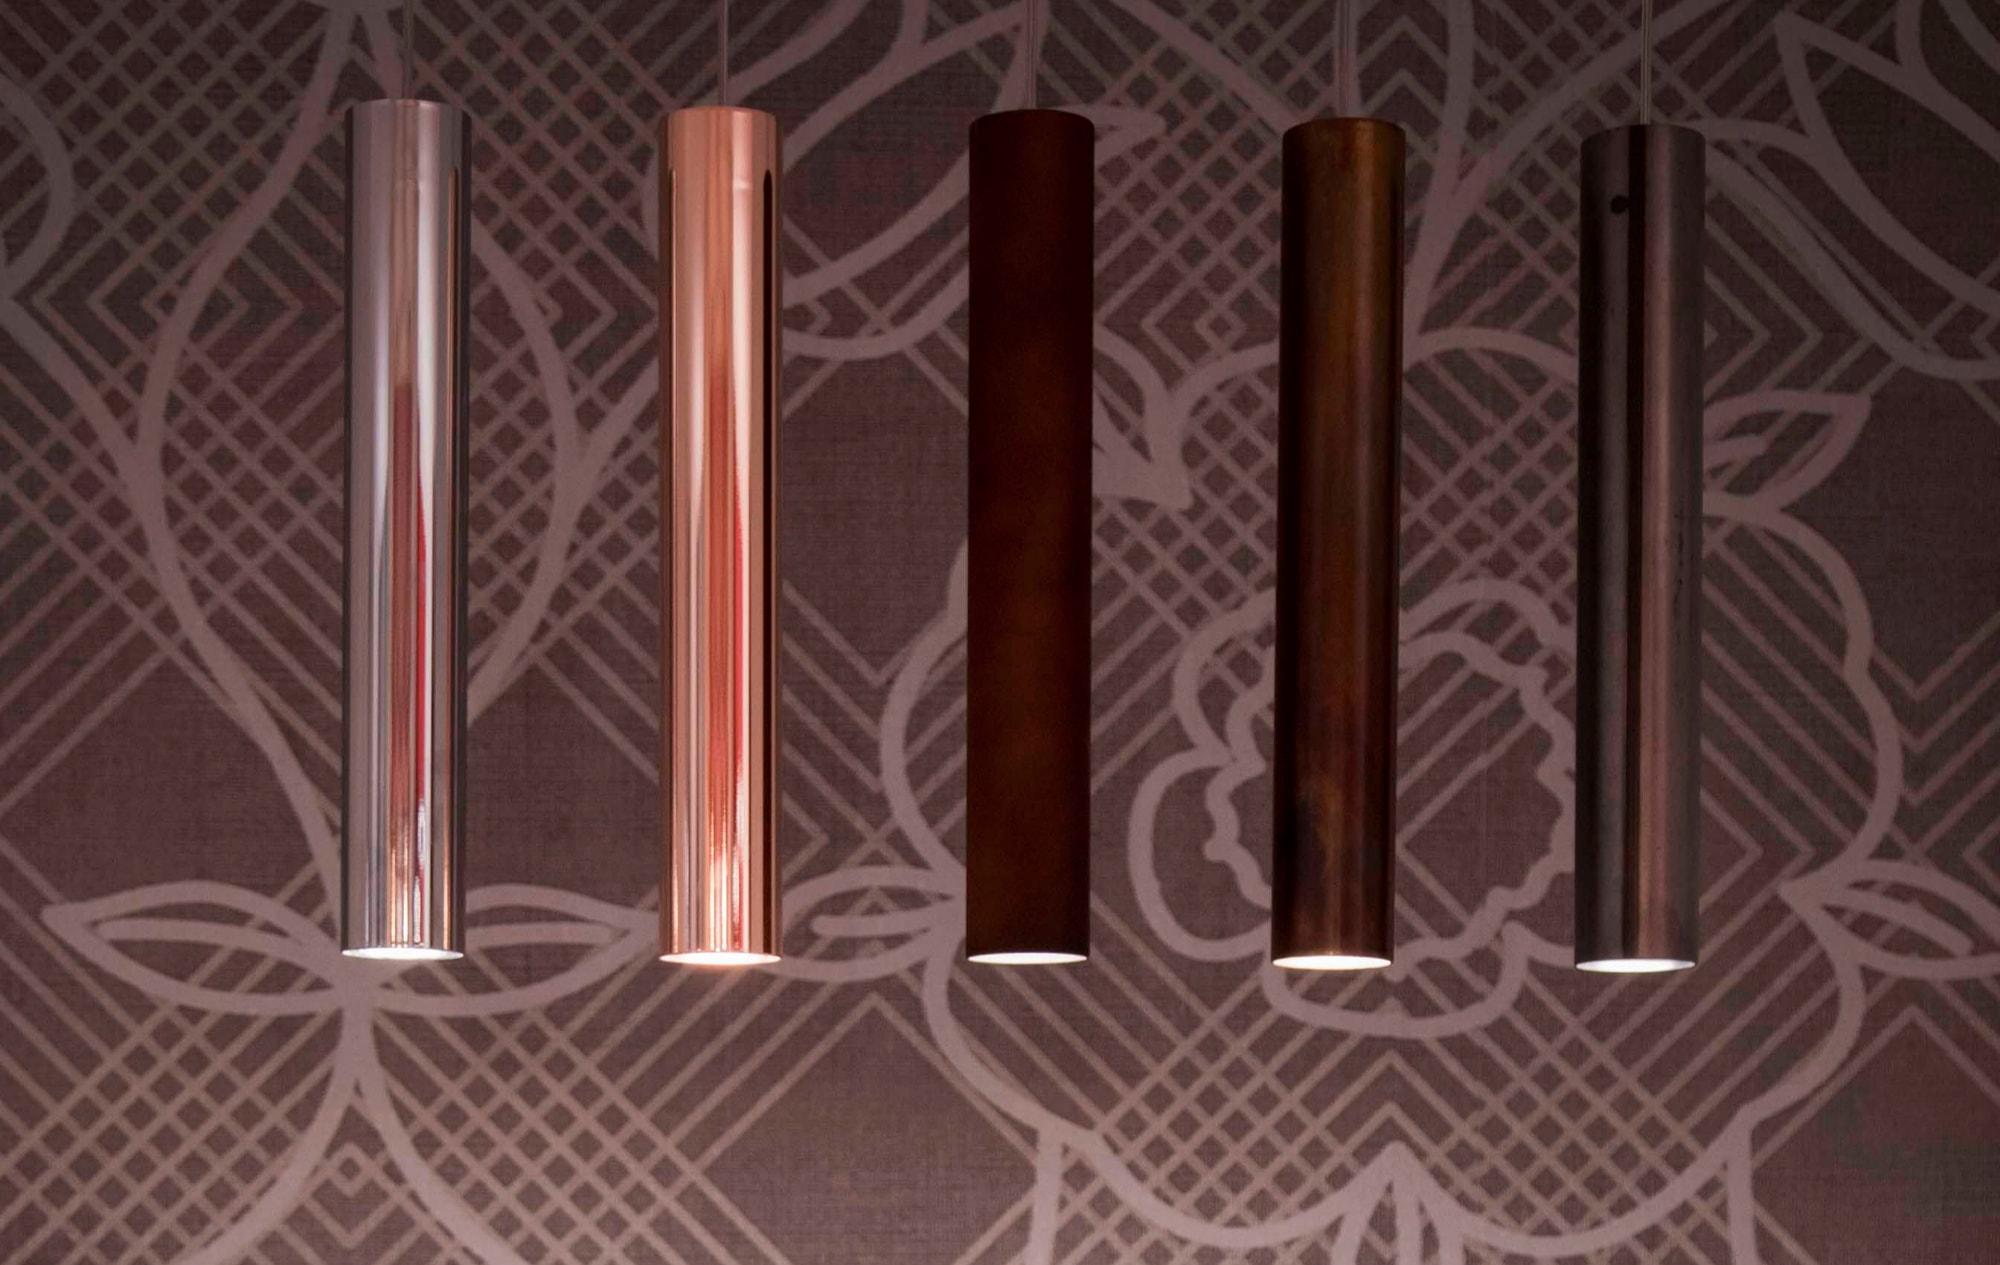 Cylinder Sospensione - Lampade a sospensione